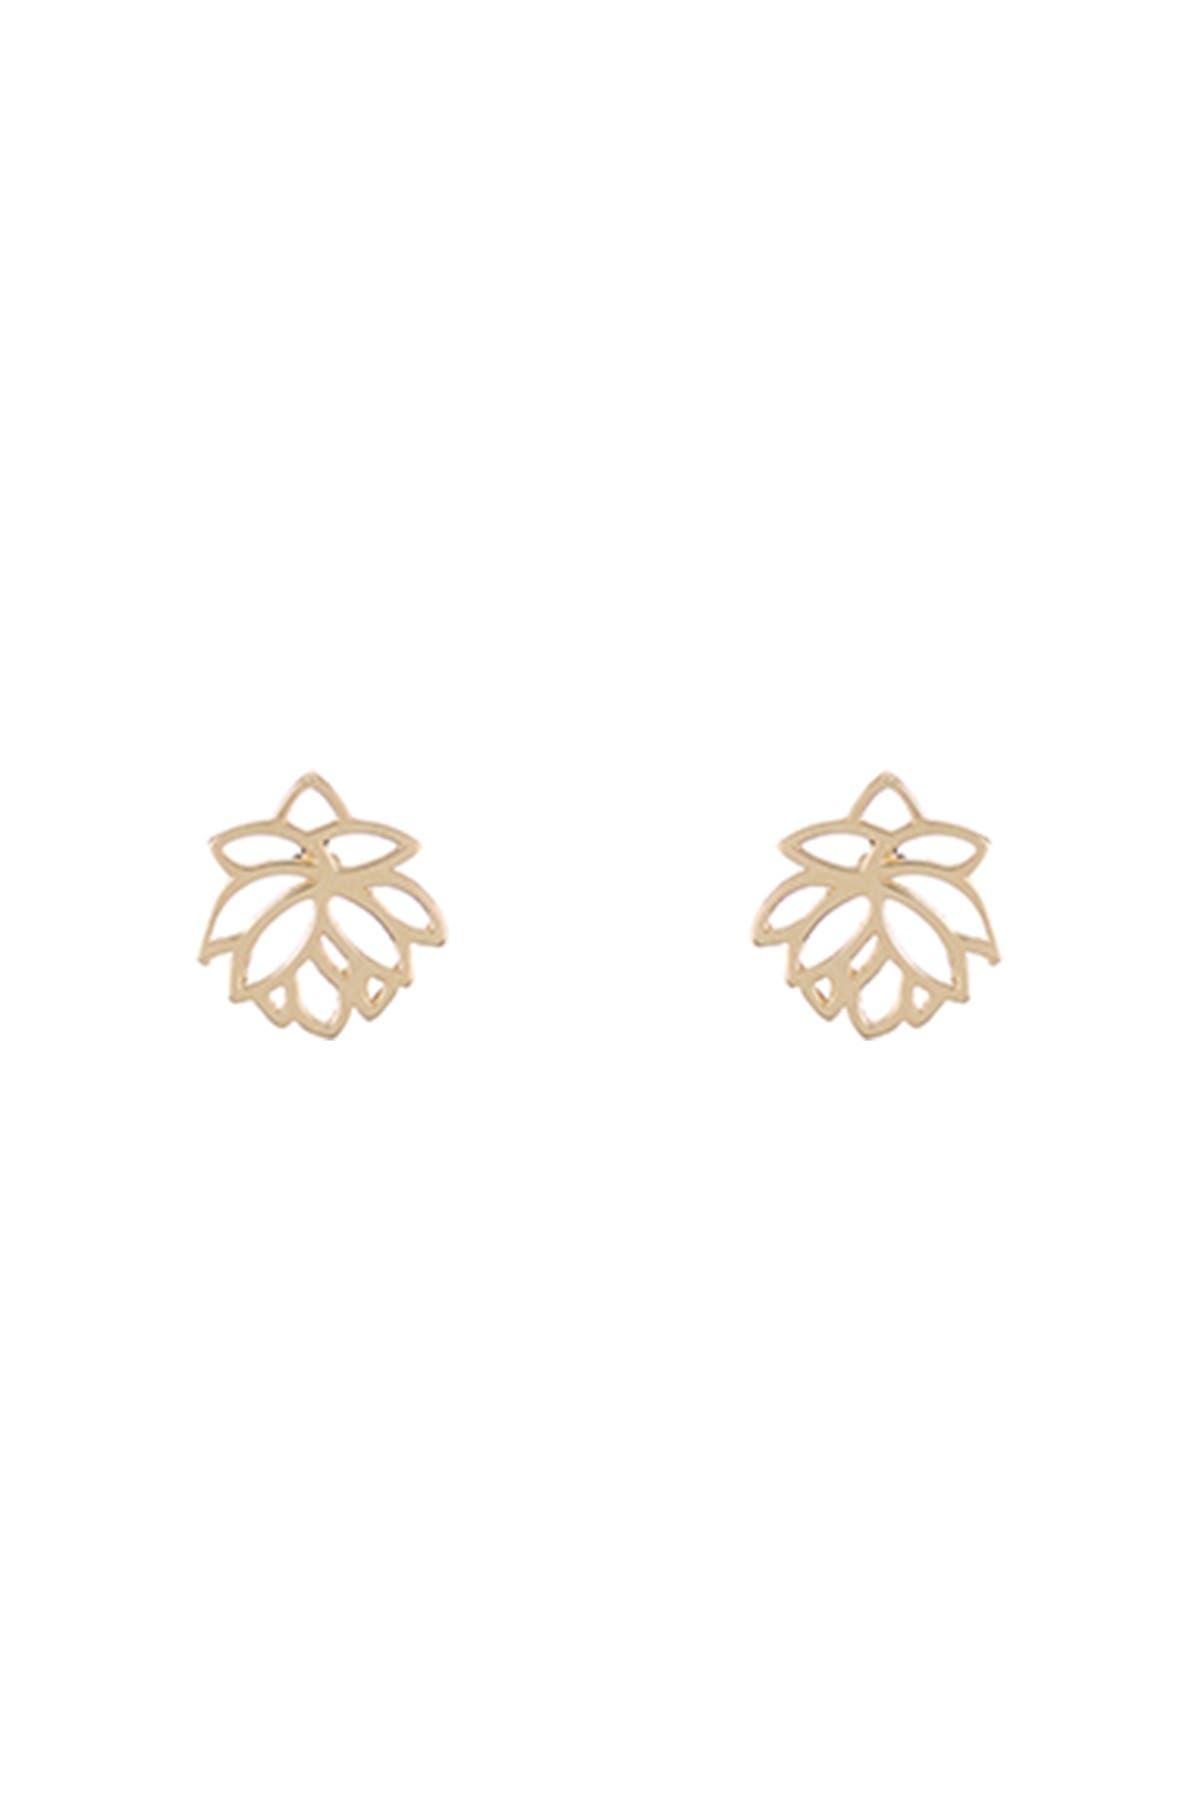 Image of KARAT RUSH 14K Yellow Gold Mini Flower Stud Earrings